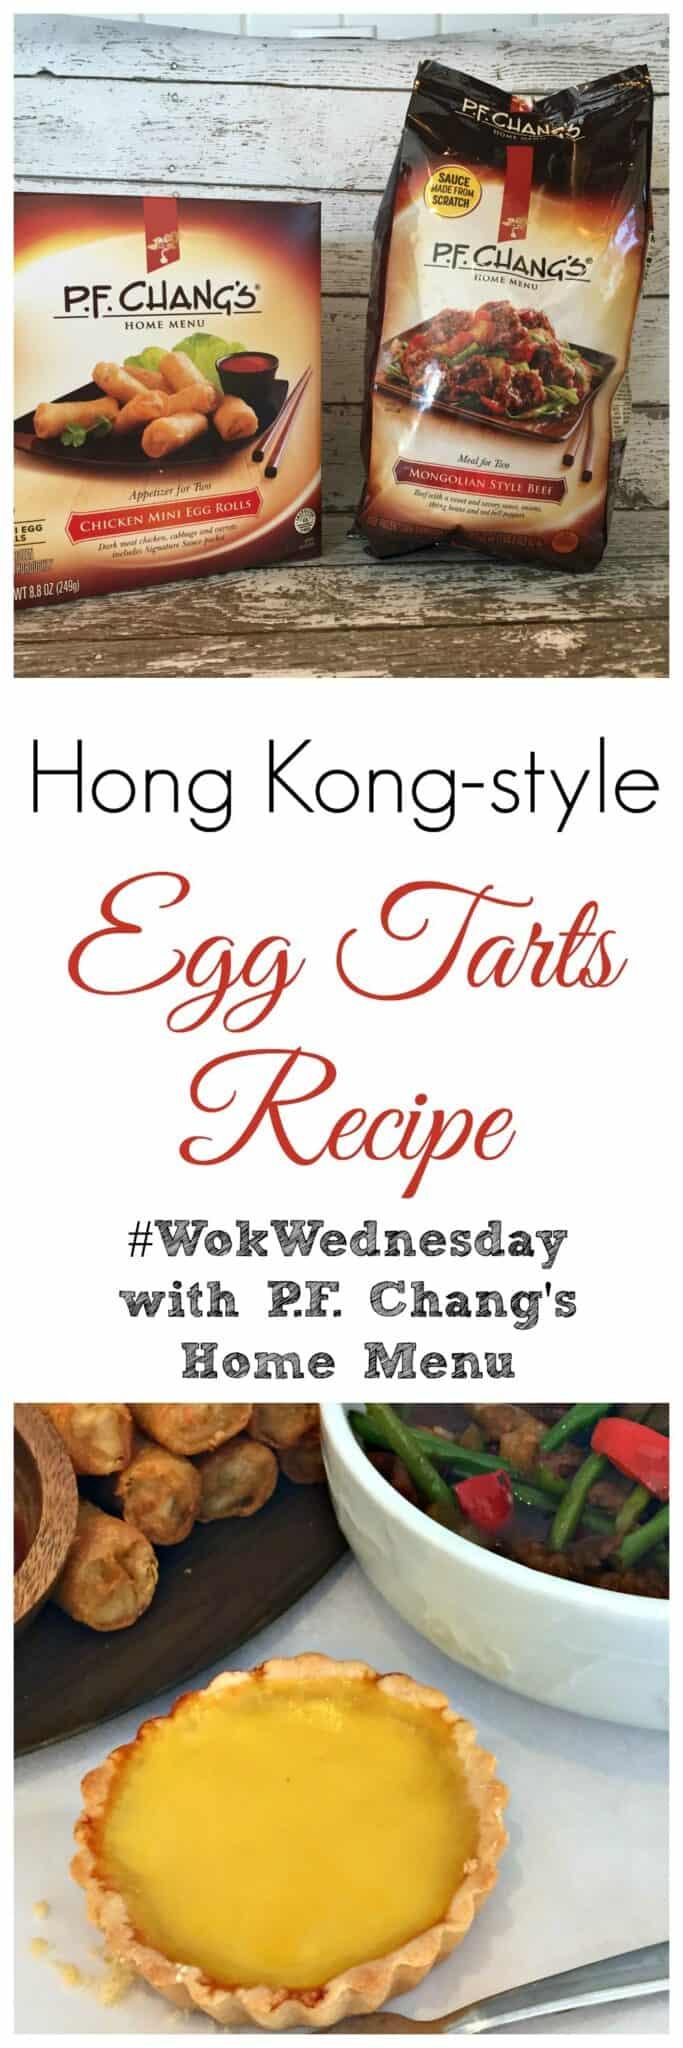 Make #WokWednesday Sweet with this Egg Tarts Recipe